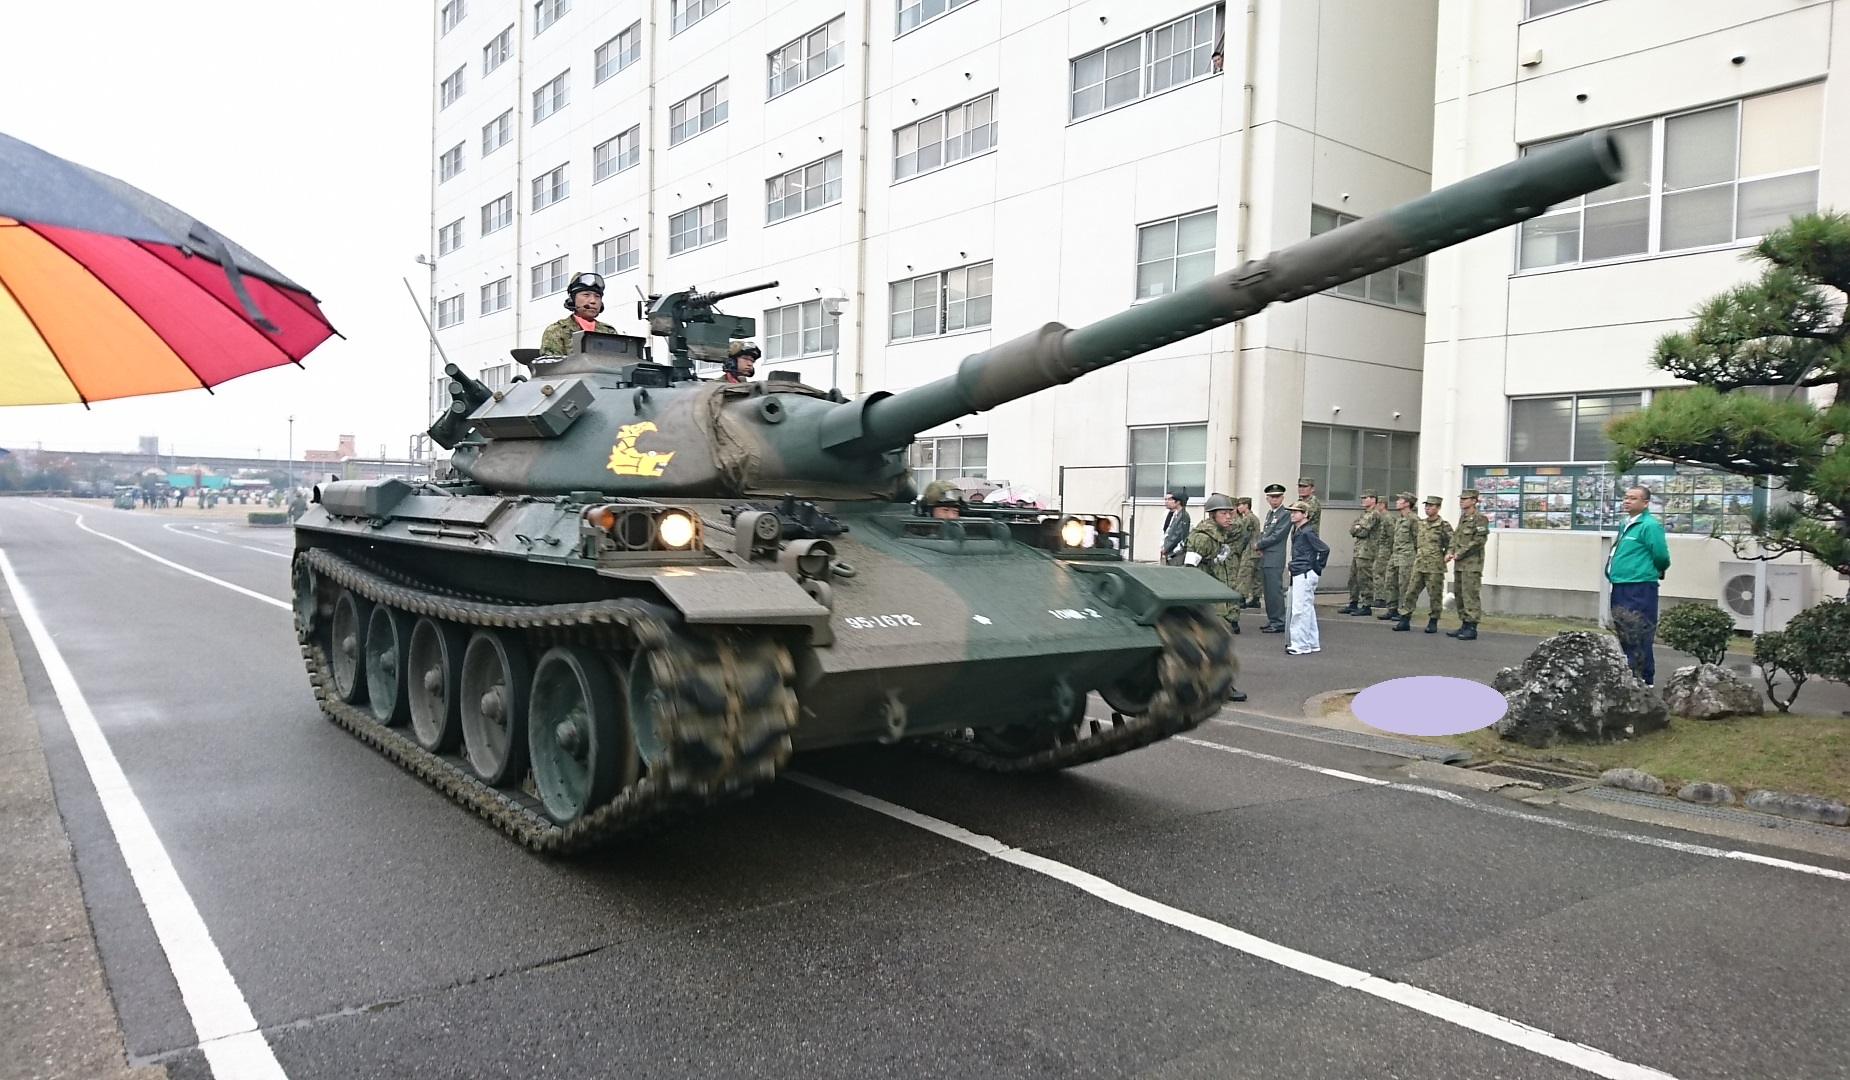 2017.10.28 守山駐屯地 (33) 74式戦車の行進 1850-1080